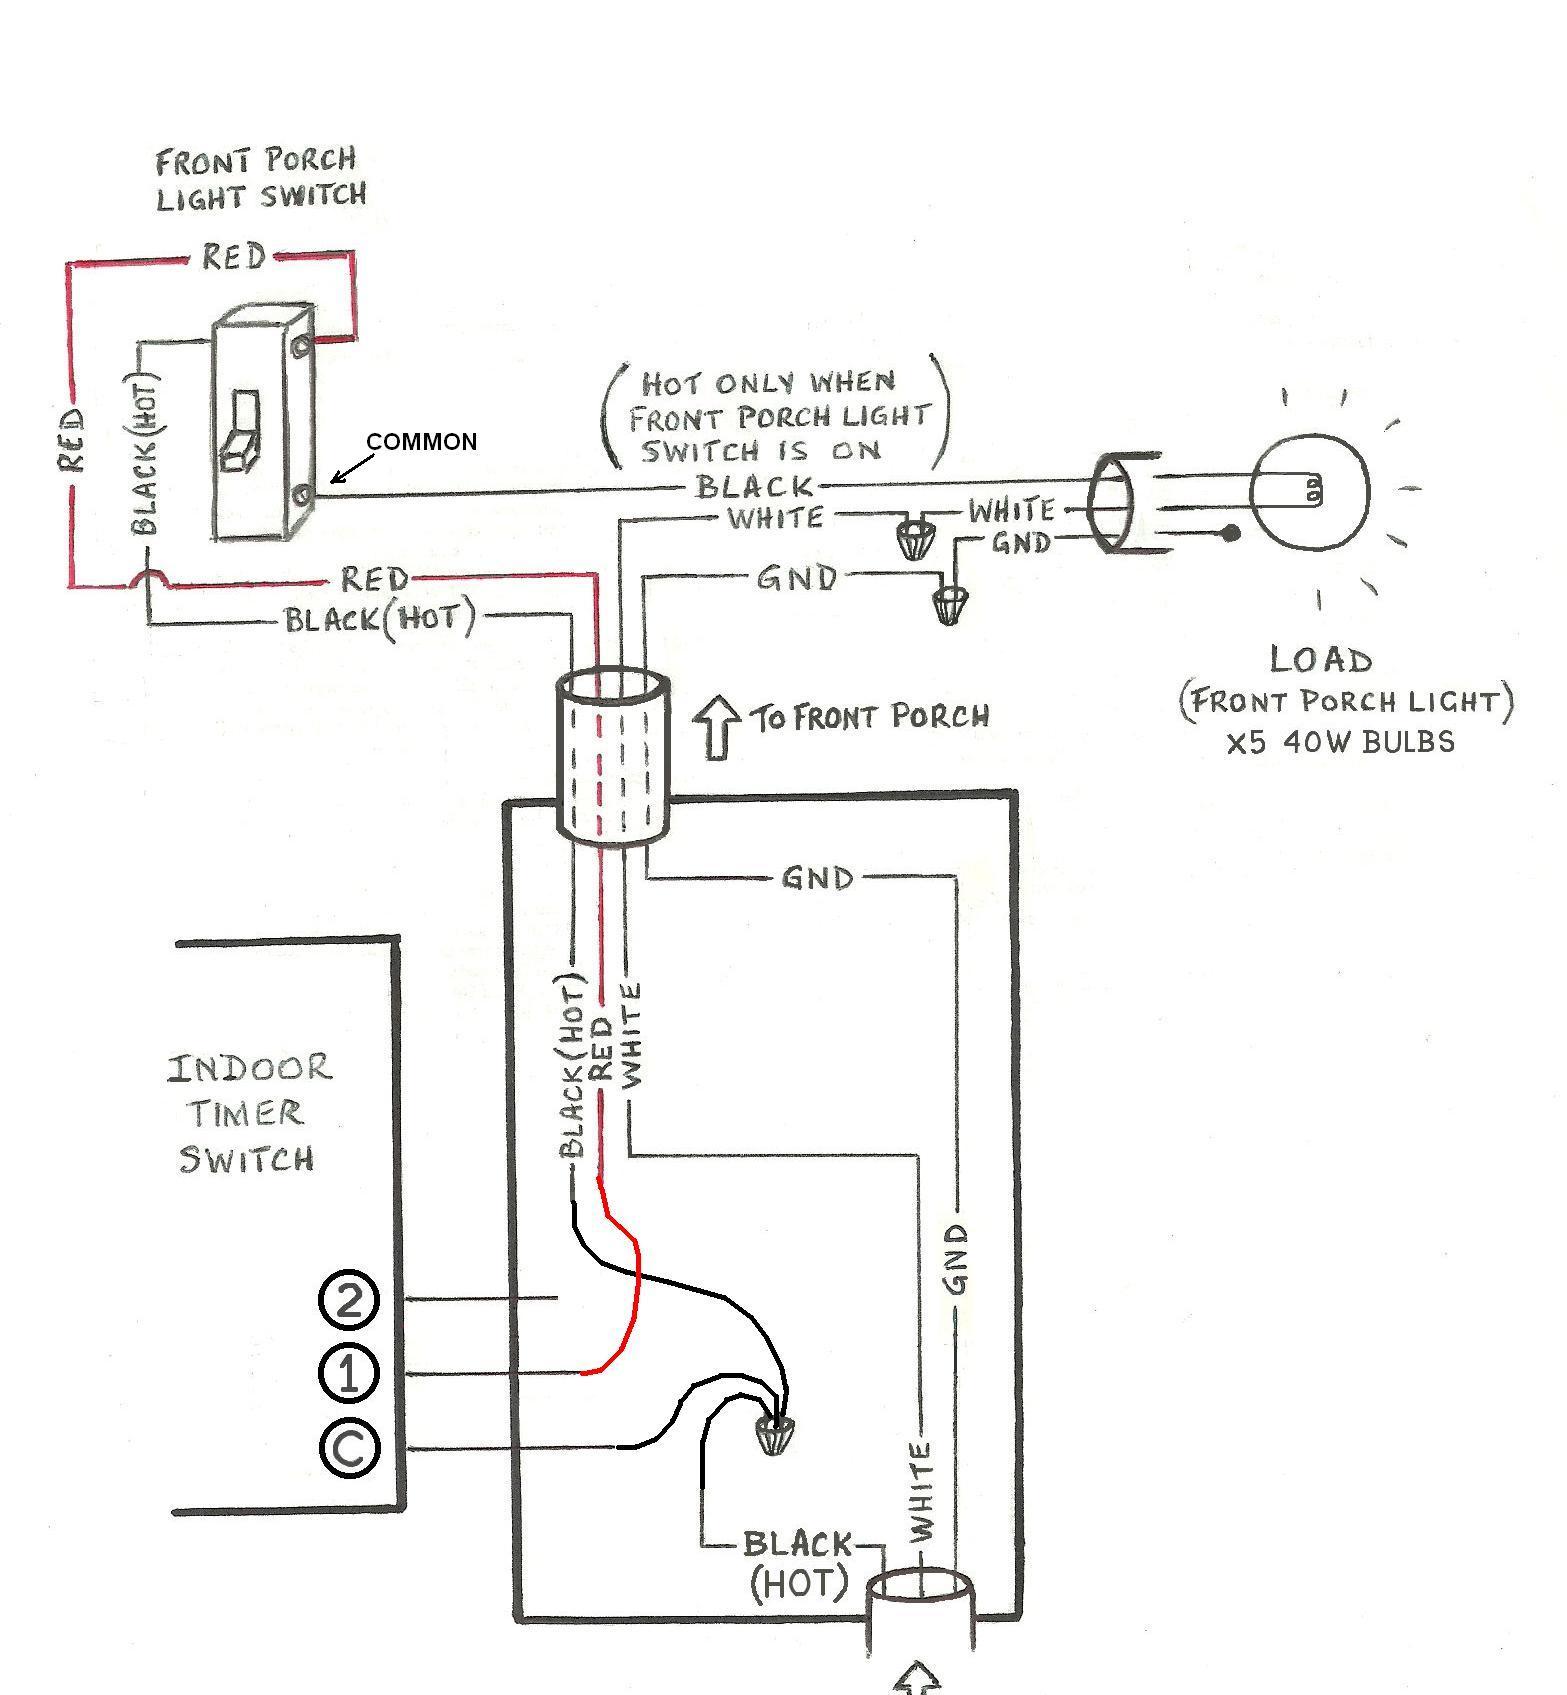 3 Way Light Diagram Google - Data Wiring Diagram Today - 3 Way Light Switching Wiring Diagram